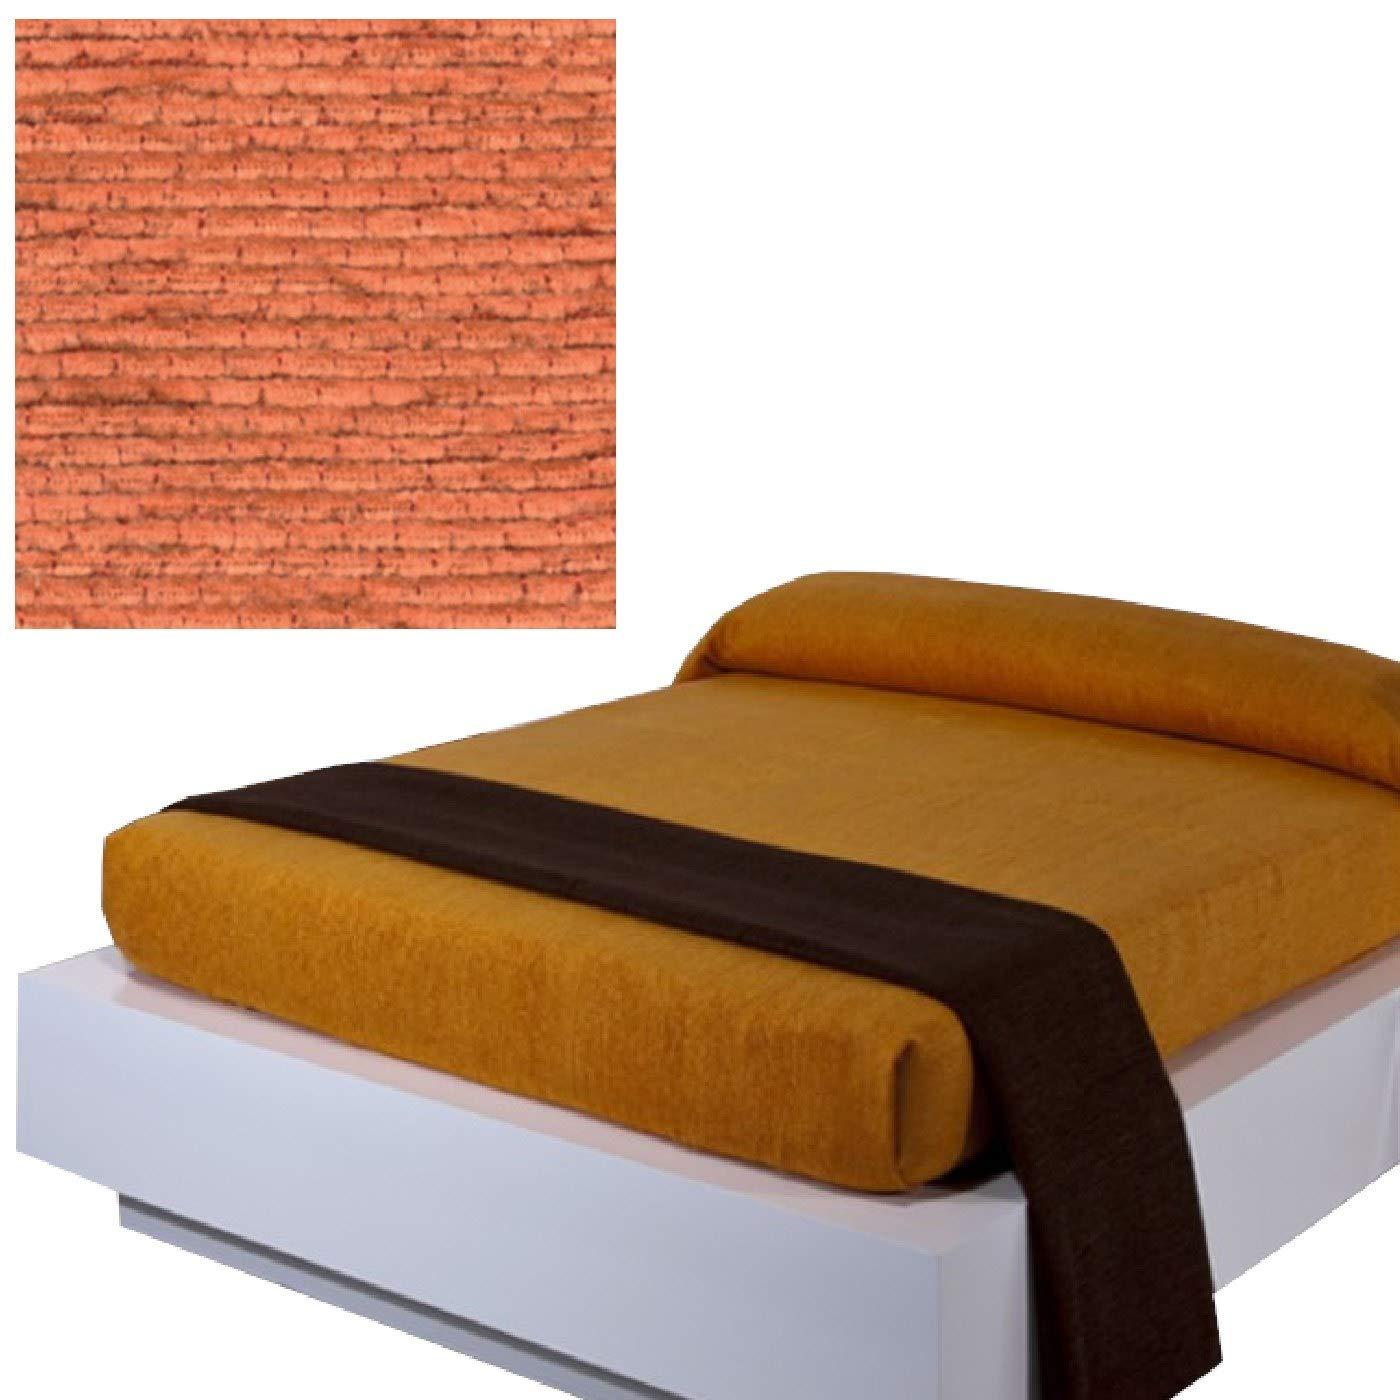 Jarrous Foulard Multiusos Modelo Calpe, Color Teja, Medida ...